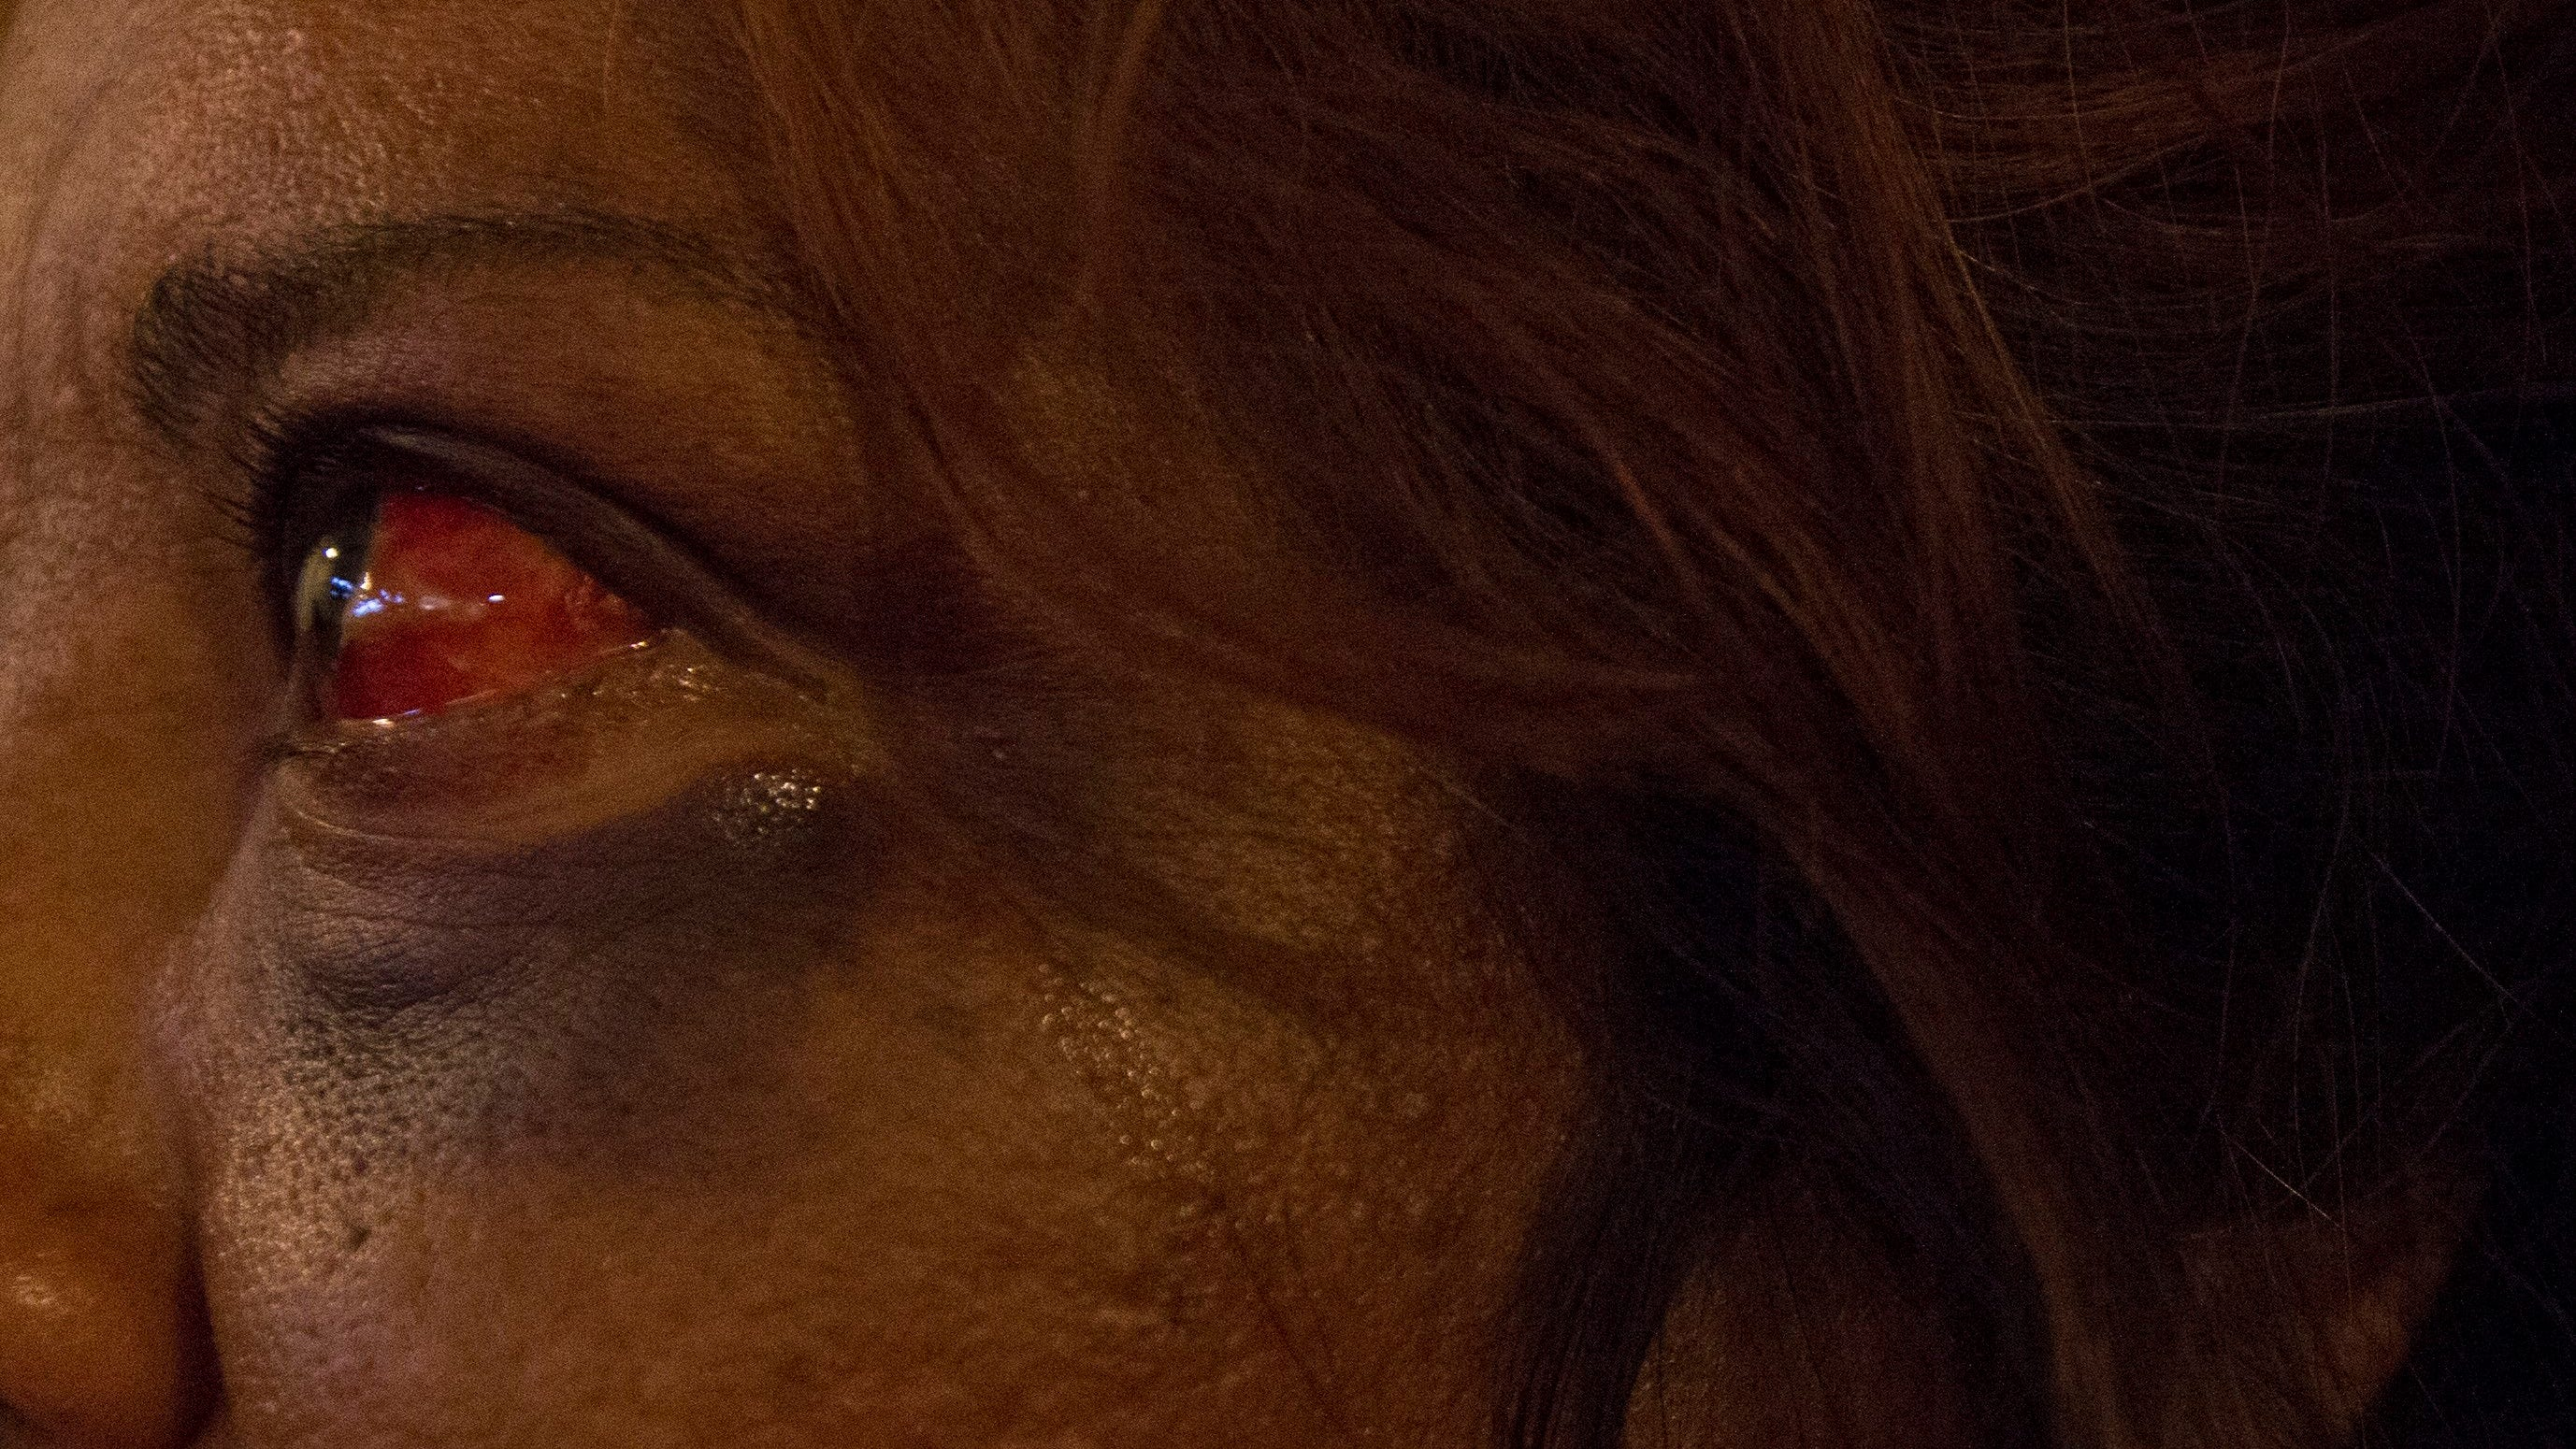 8dc6d672 aa3a 4135 86c9 6e61dda7bacf Domestic violence womens shelter 2015 JPG?crop=2755,1550,x0,y200&width=2755&height=1550&format=pjpg&auto=webp.